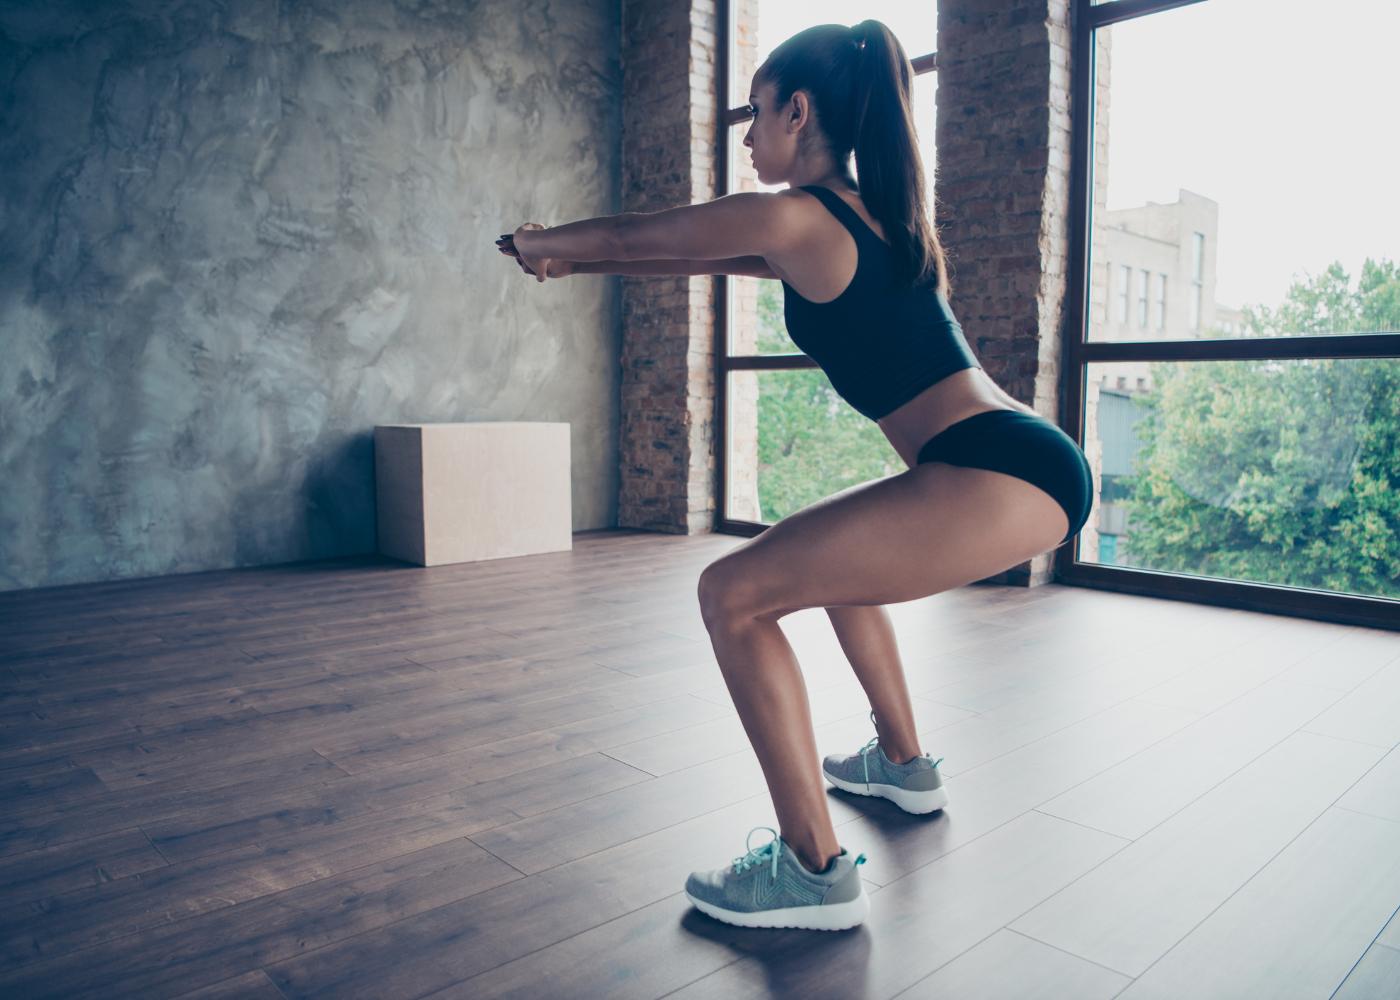 tonificar o corpo agachamento com kickback